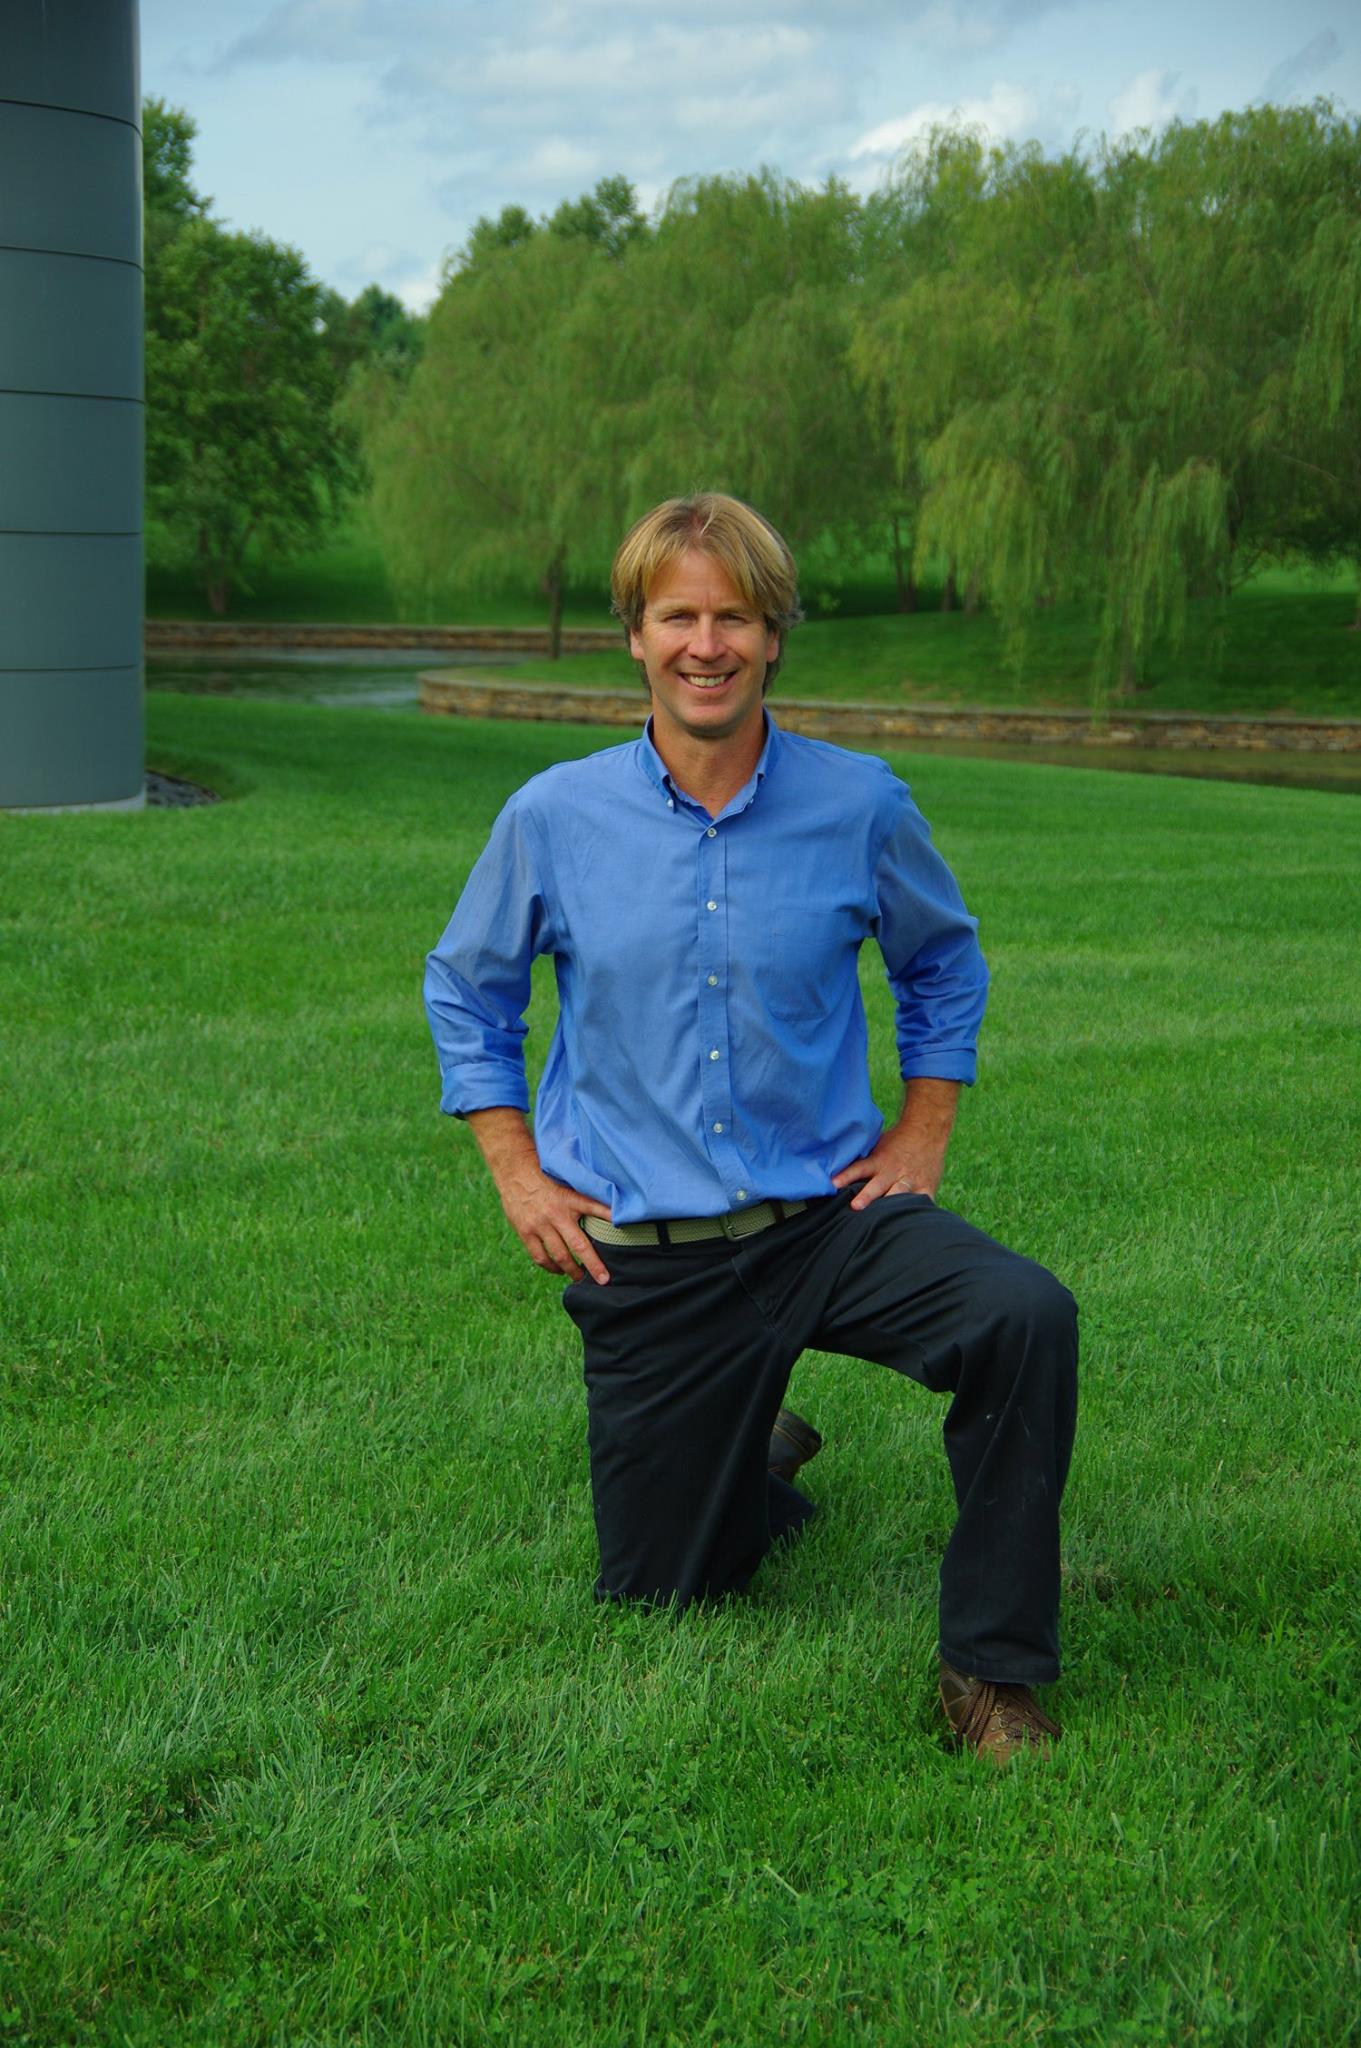 Paul Tukey, Director of Environmental Stewardship at Glenstone Museum